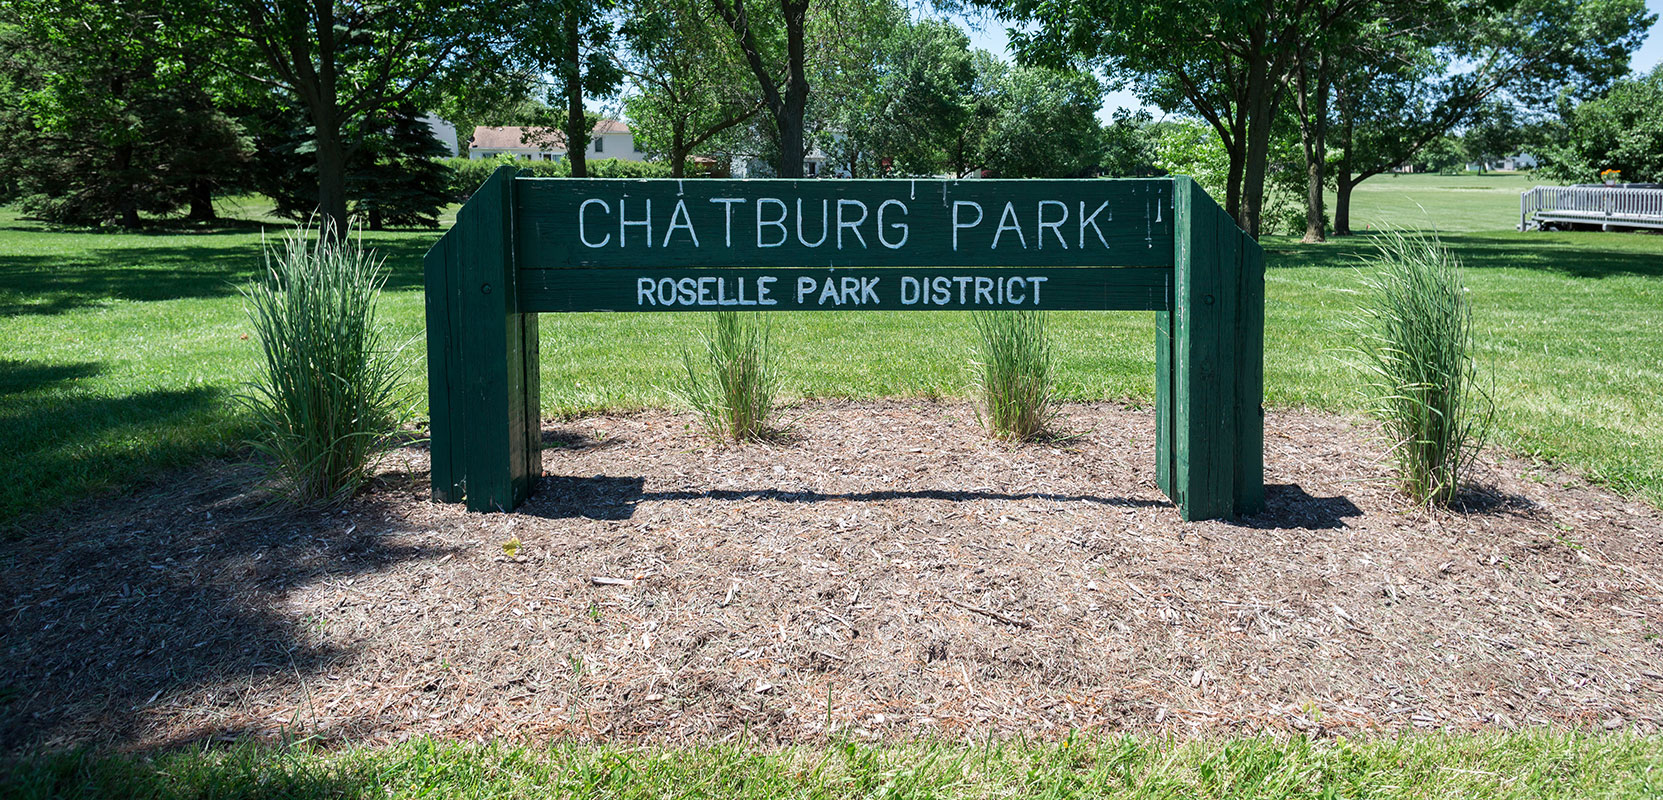 Chatburg Park